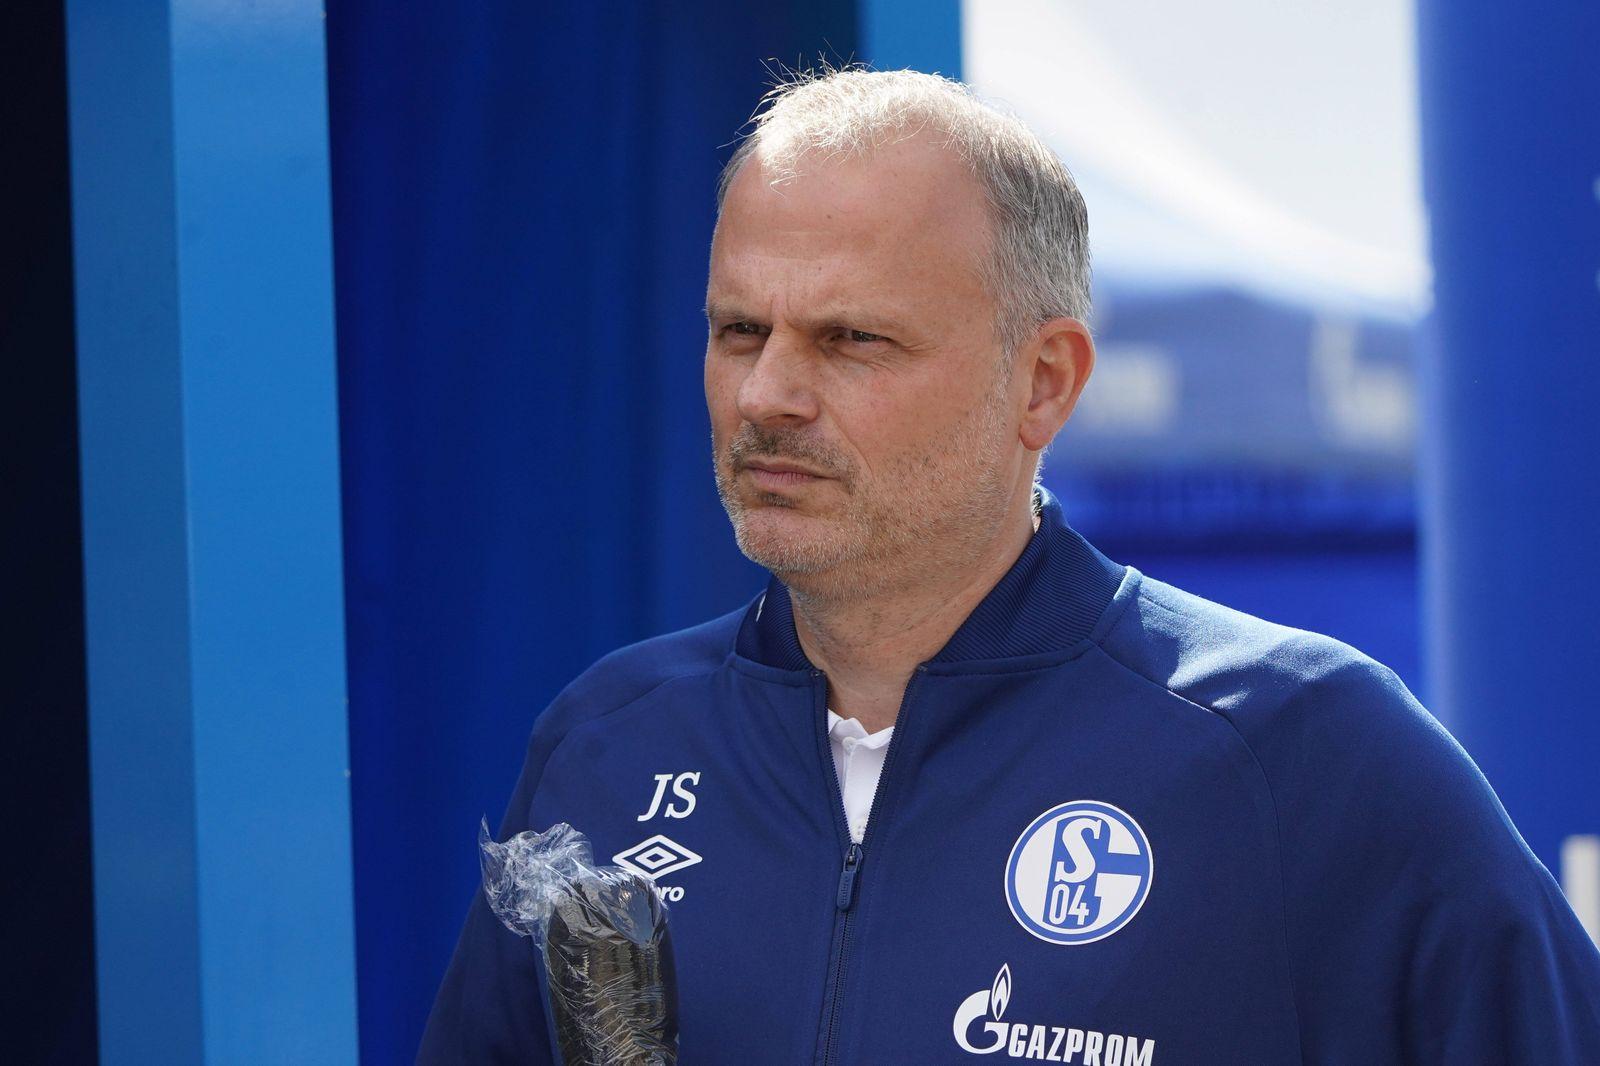 Fussball 1.BL Saison 2020/2021,Corona, Covid 19 Freundschaftsspiel. Testspiel, FC Schalke 04 vs VfL Bochum, 05.09.2020,G